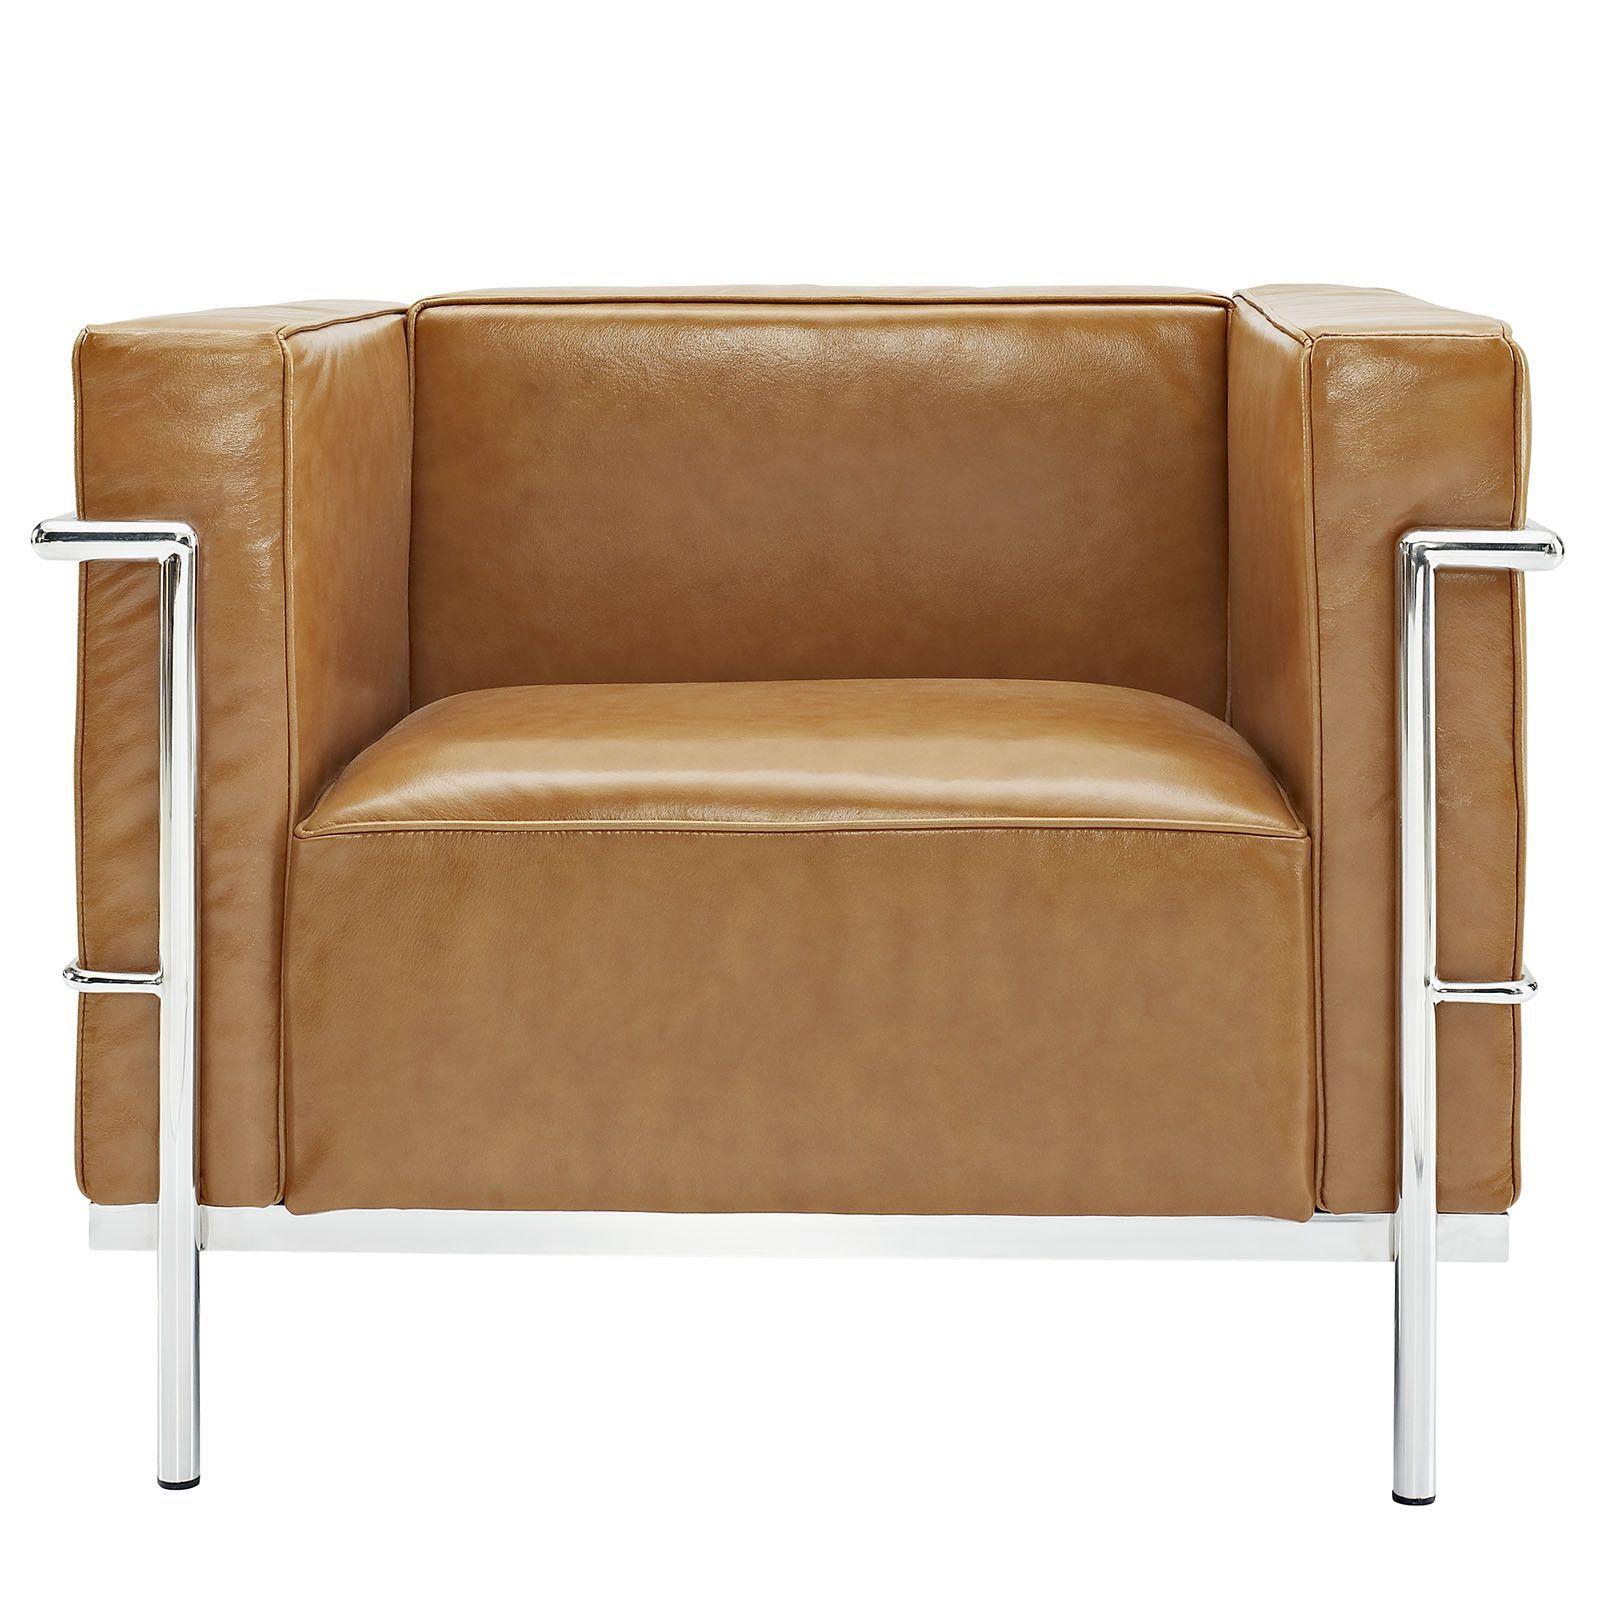 Barcelona chair back - Modway Charles Grande Armchair